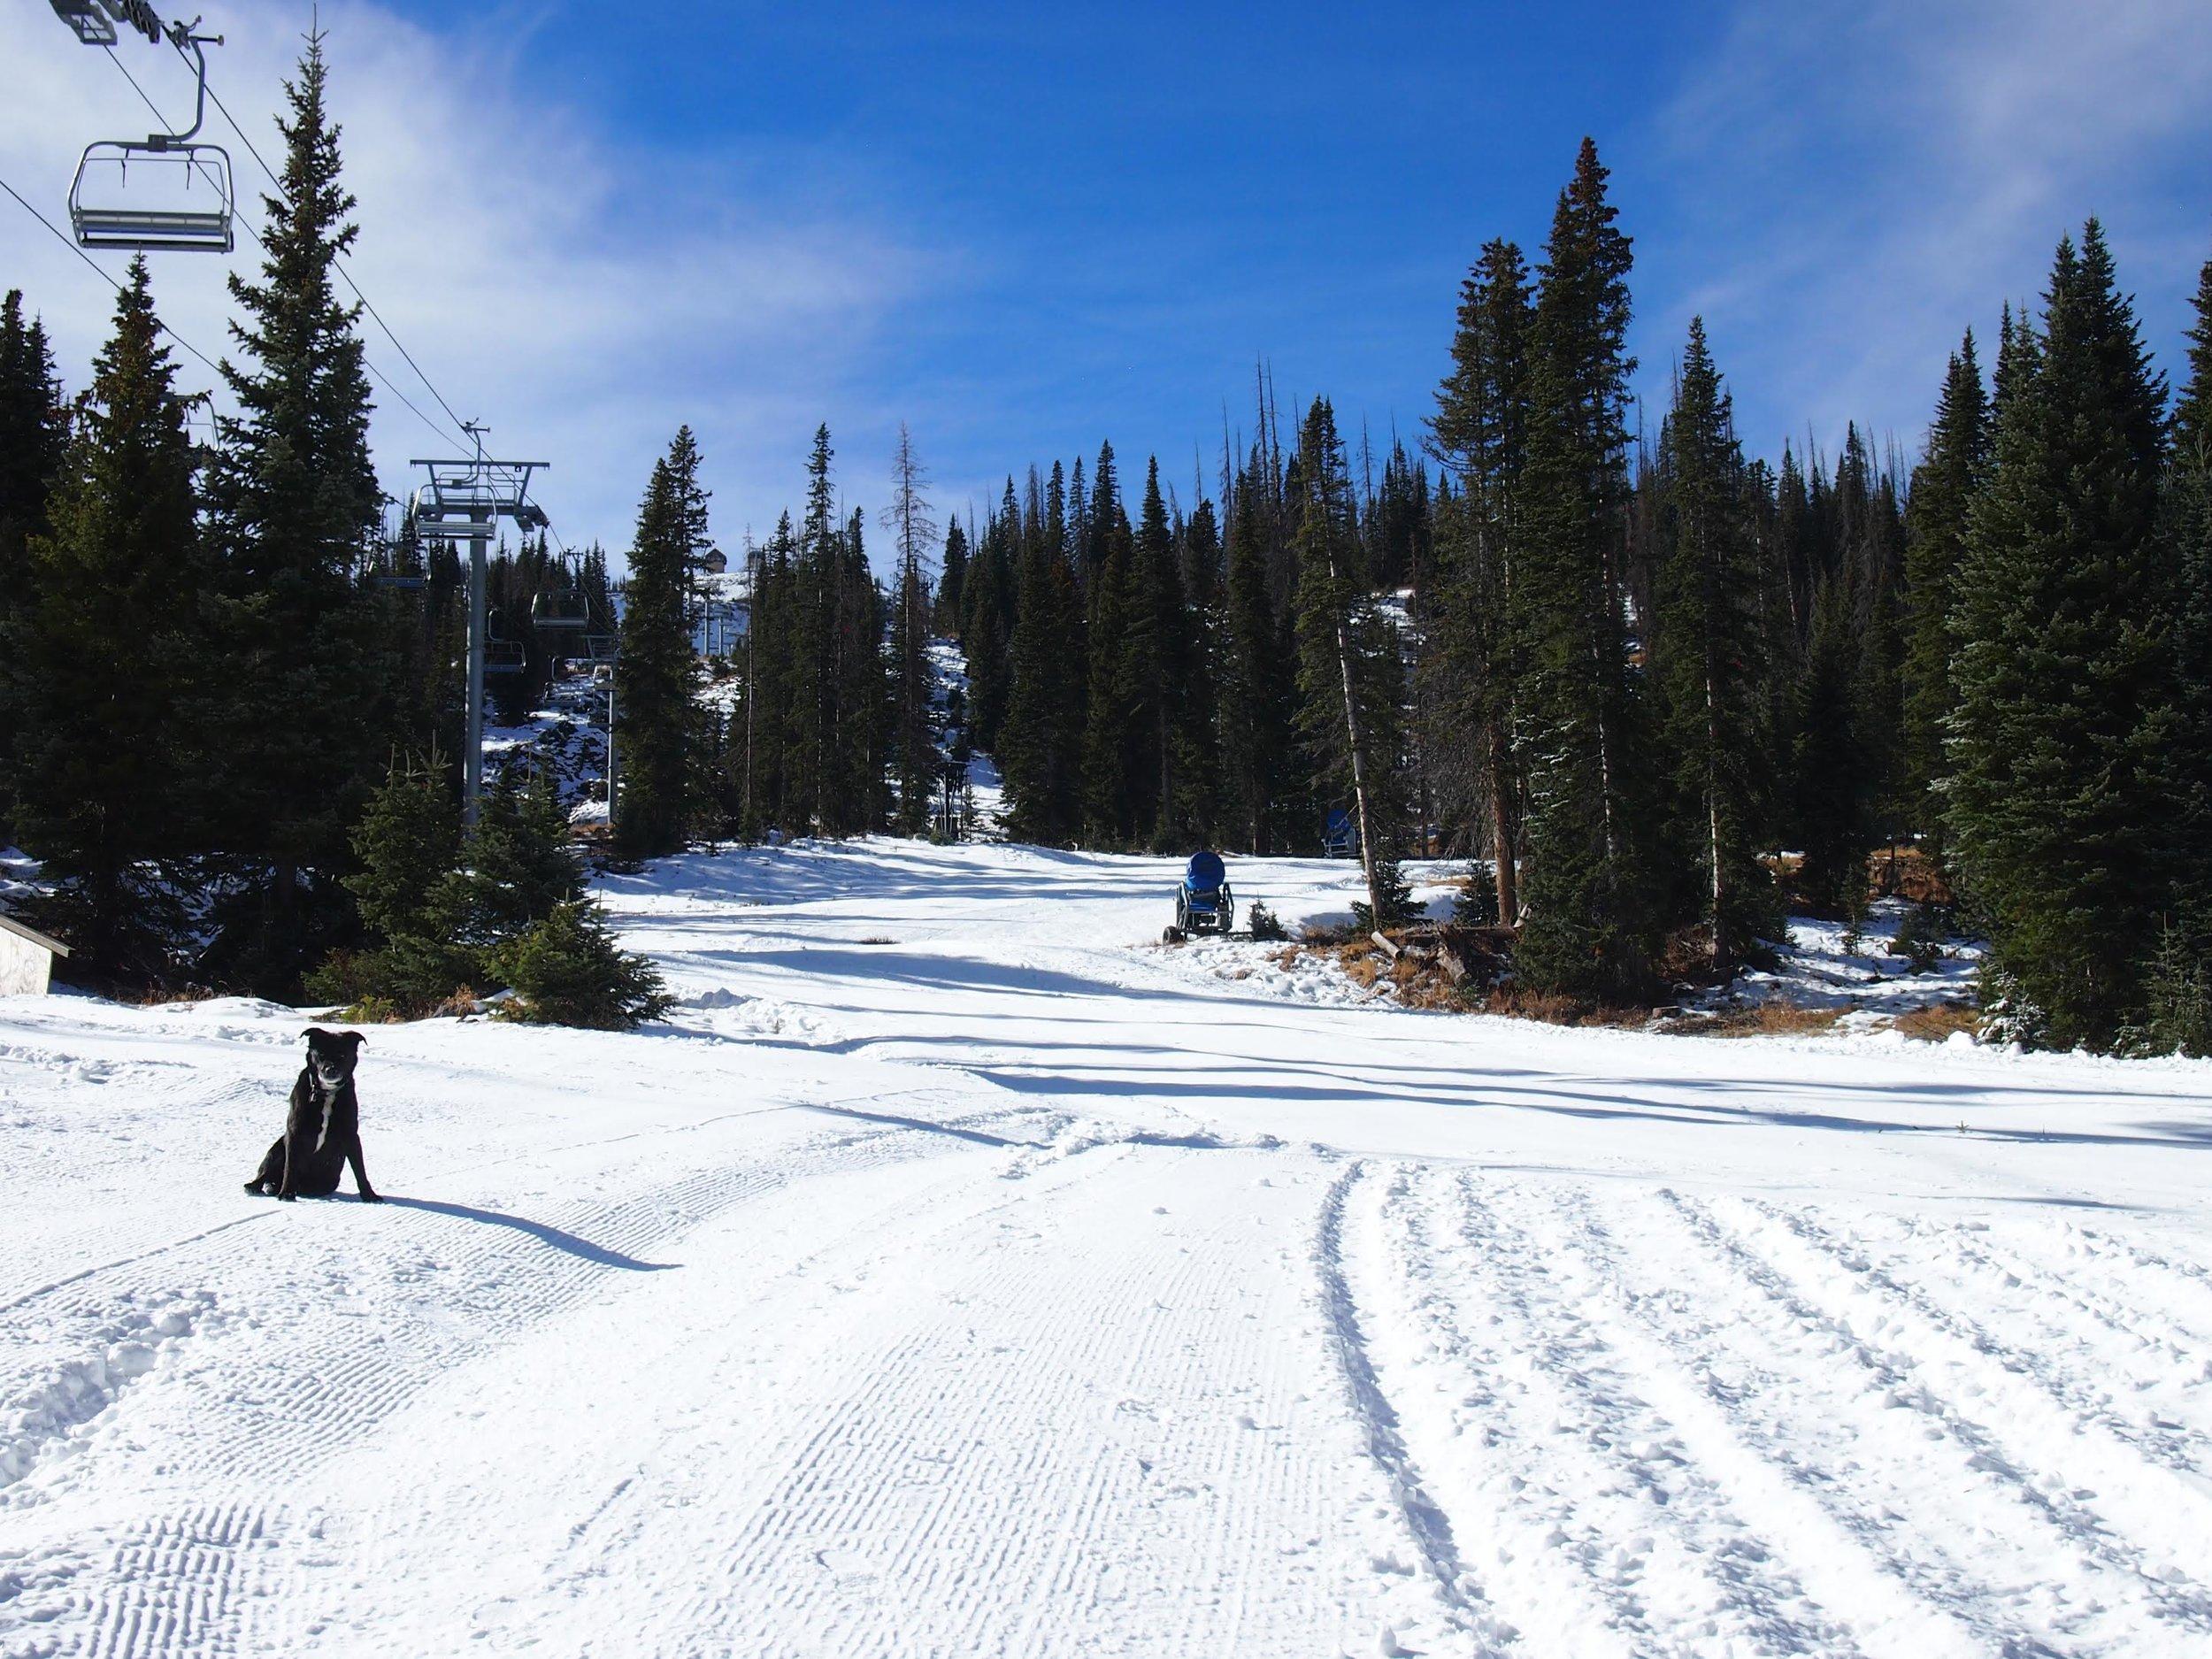 P: Rosanne H. Pitcher, Wolf Creek Ski Area